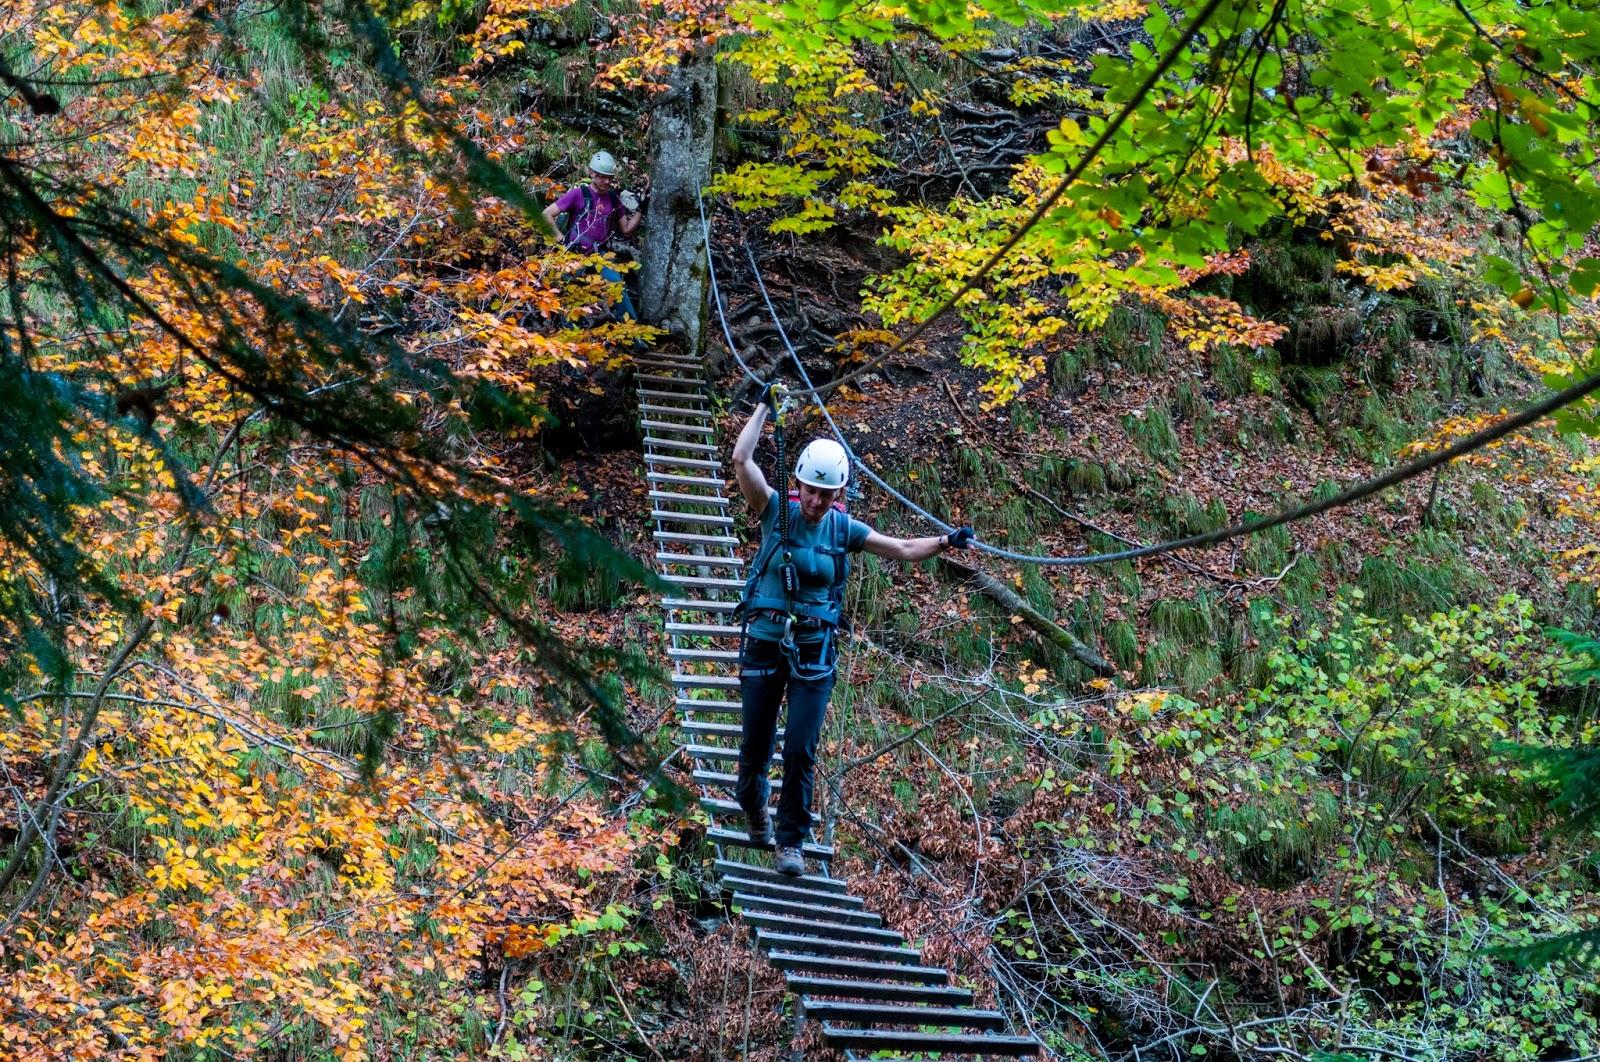 Klettersteig Postalm : Postalmklamm klettersteig d f postalm m salzkammergut